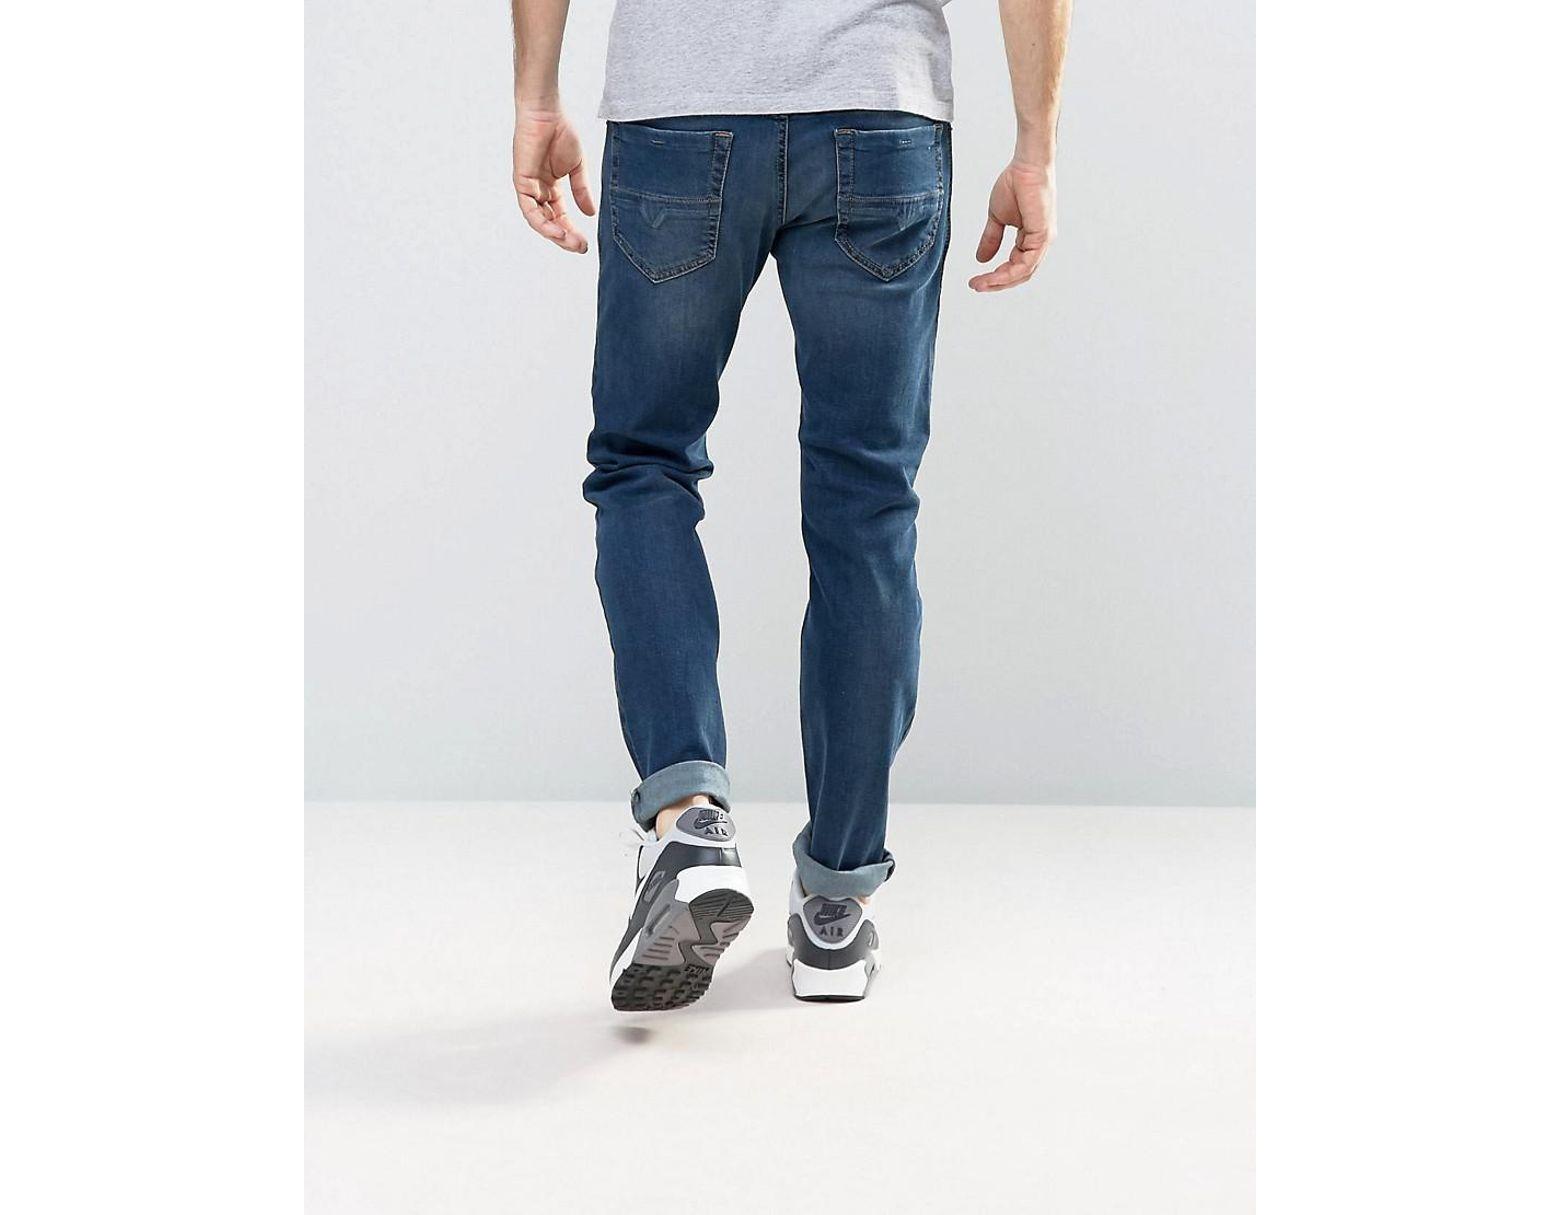 fc694b0c DIESEL Thommer Stretch Slim Fit Jeans In 084bu Dark Wash in Blue for Men -  Lyst